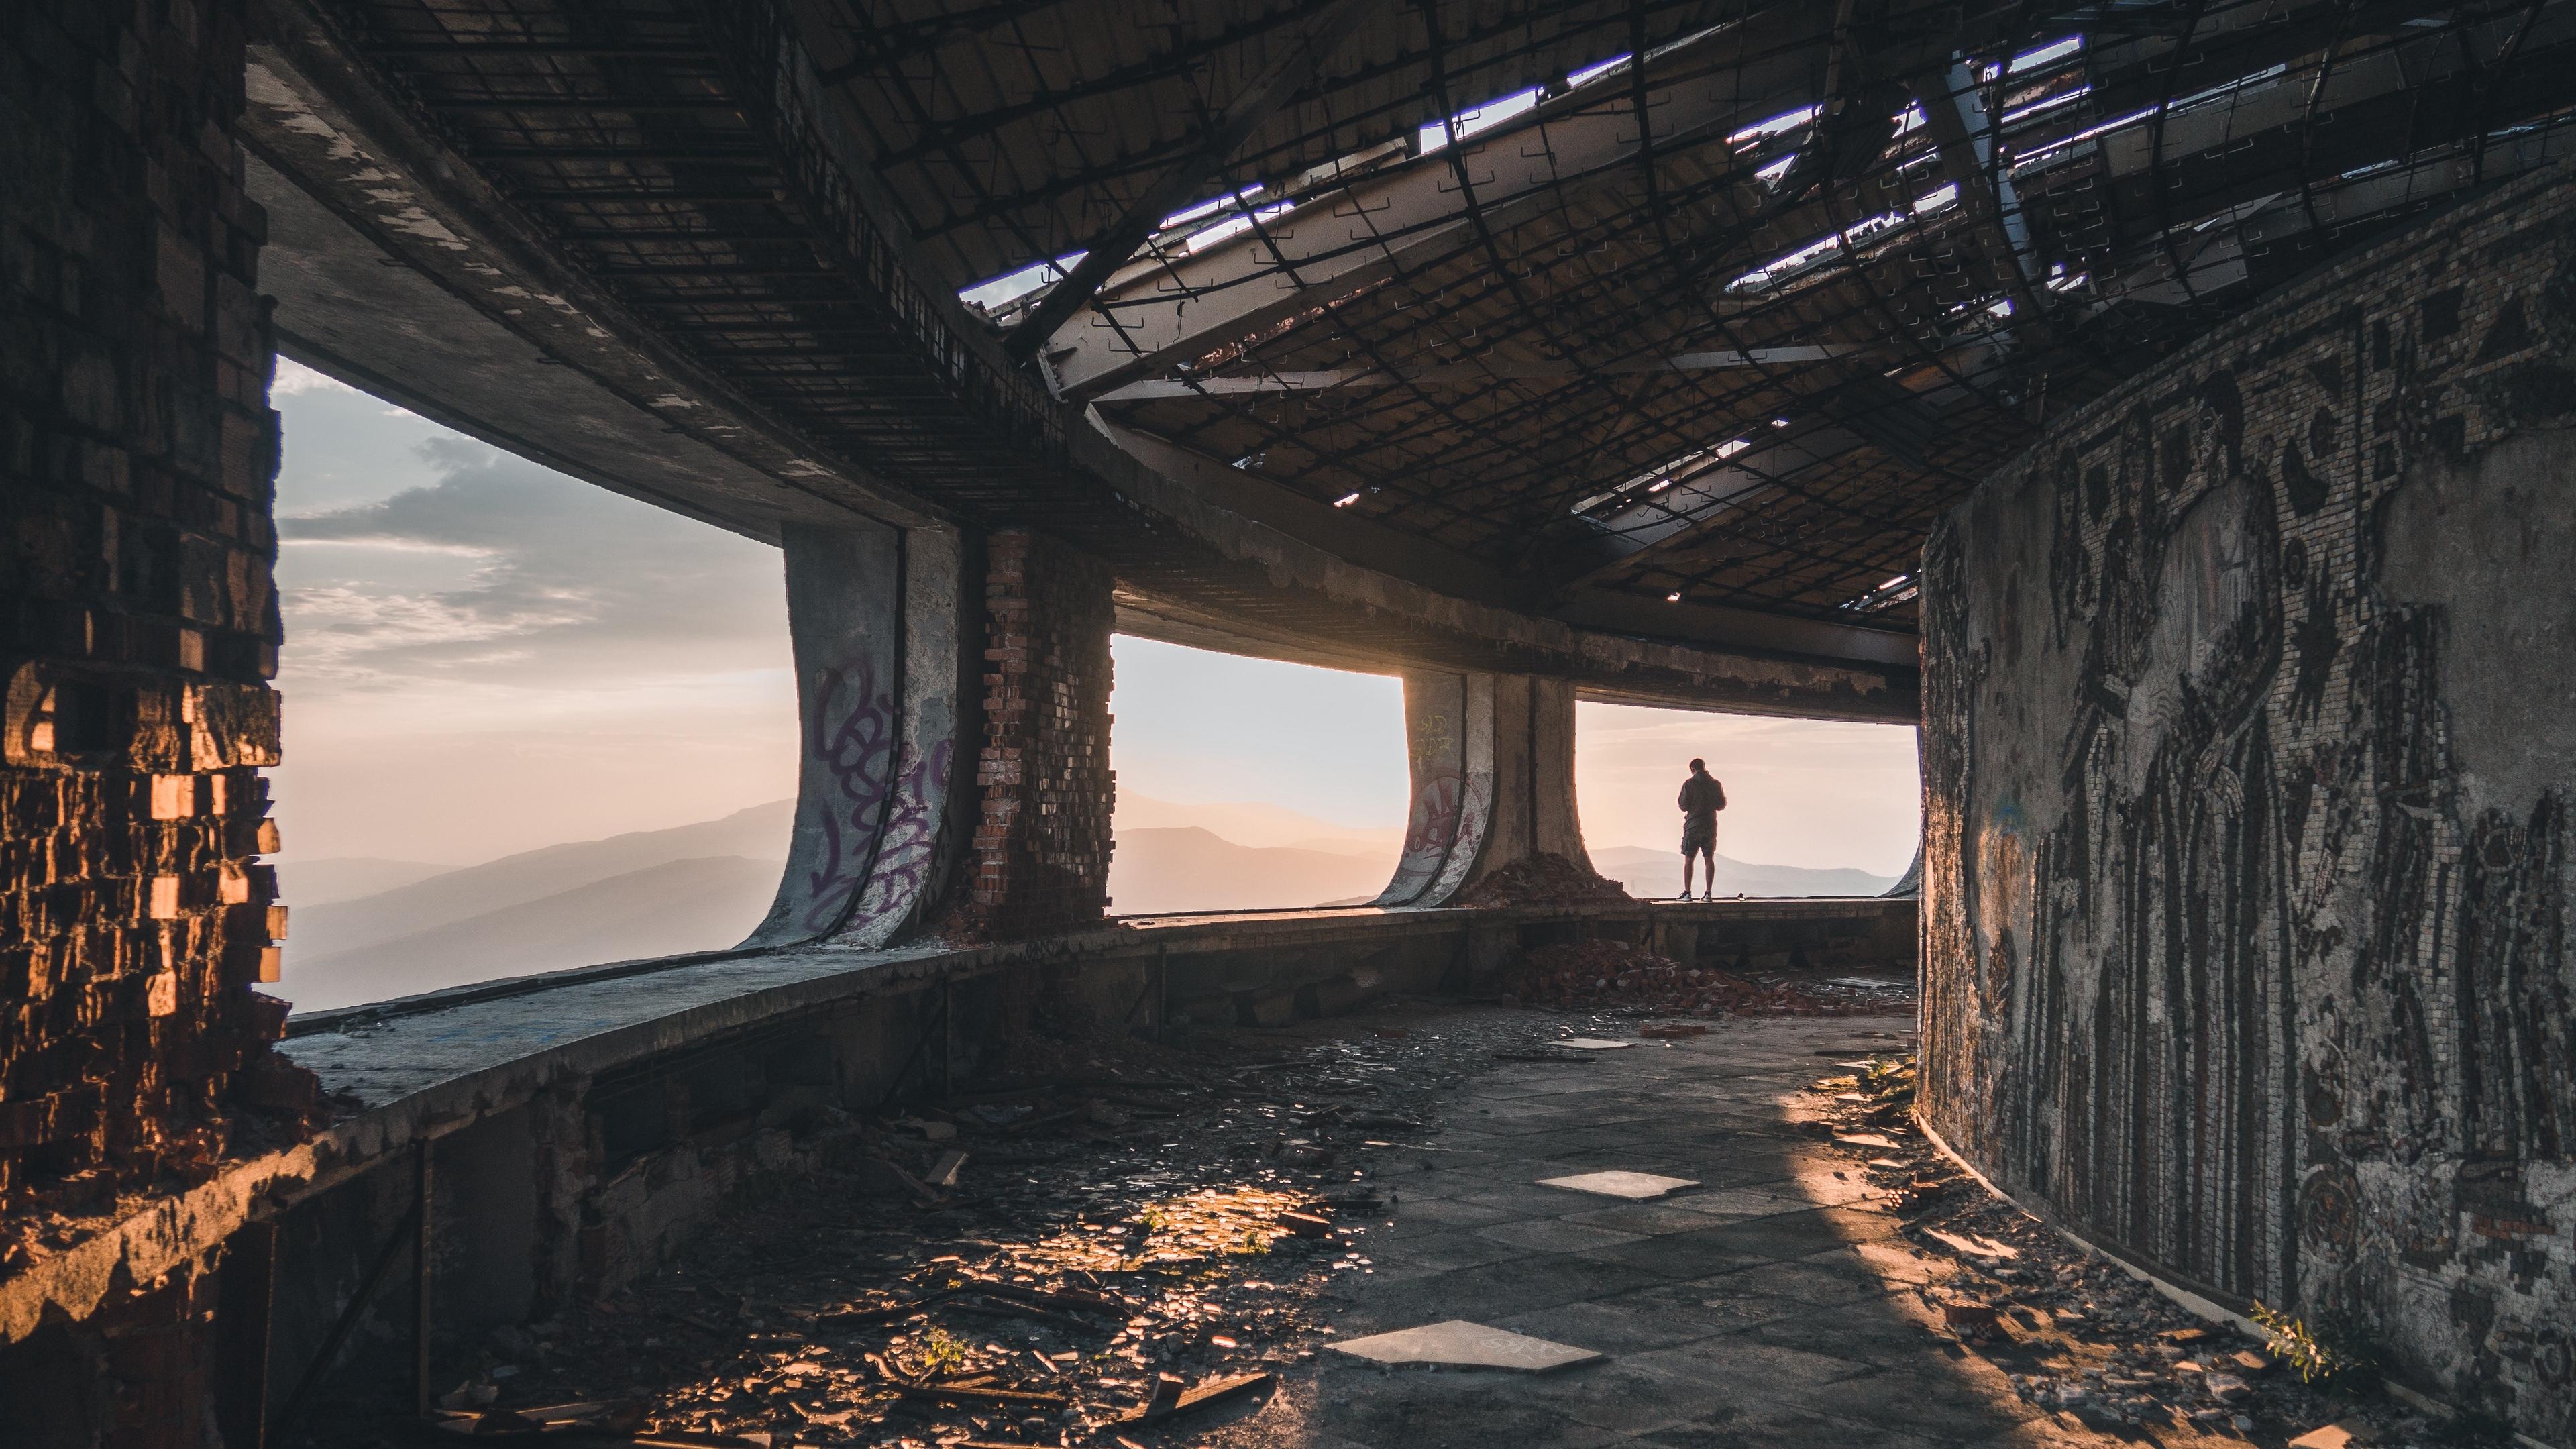 ruins man loneliness buzludzha bulgaria 4k 1538068449 - ruins, man, loneliness, buzludzha, bulgaria 4k - Ruins, Man, loneliness